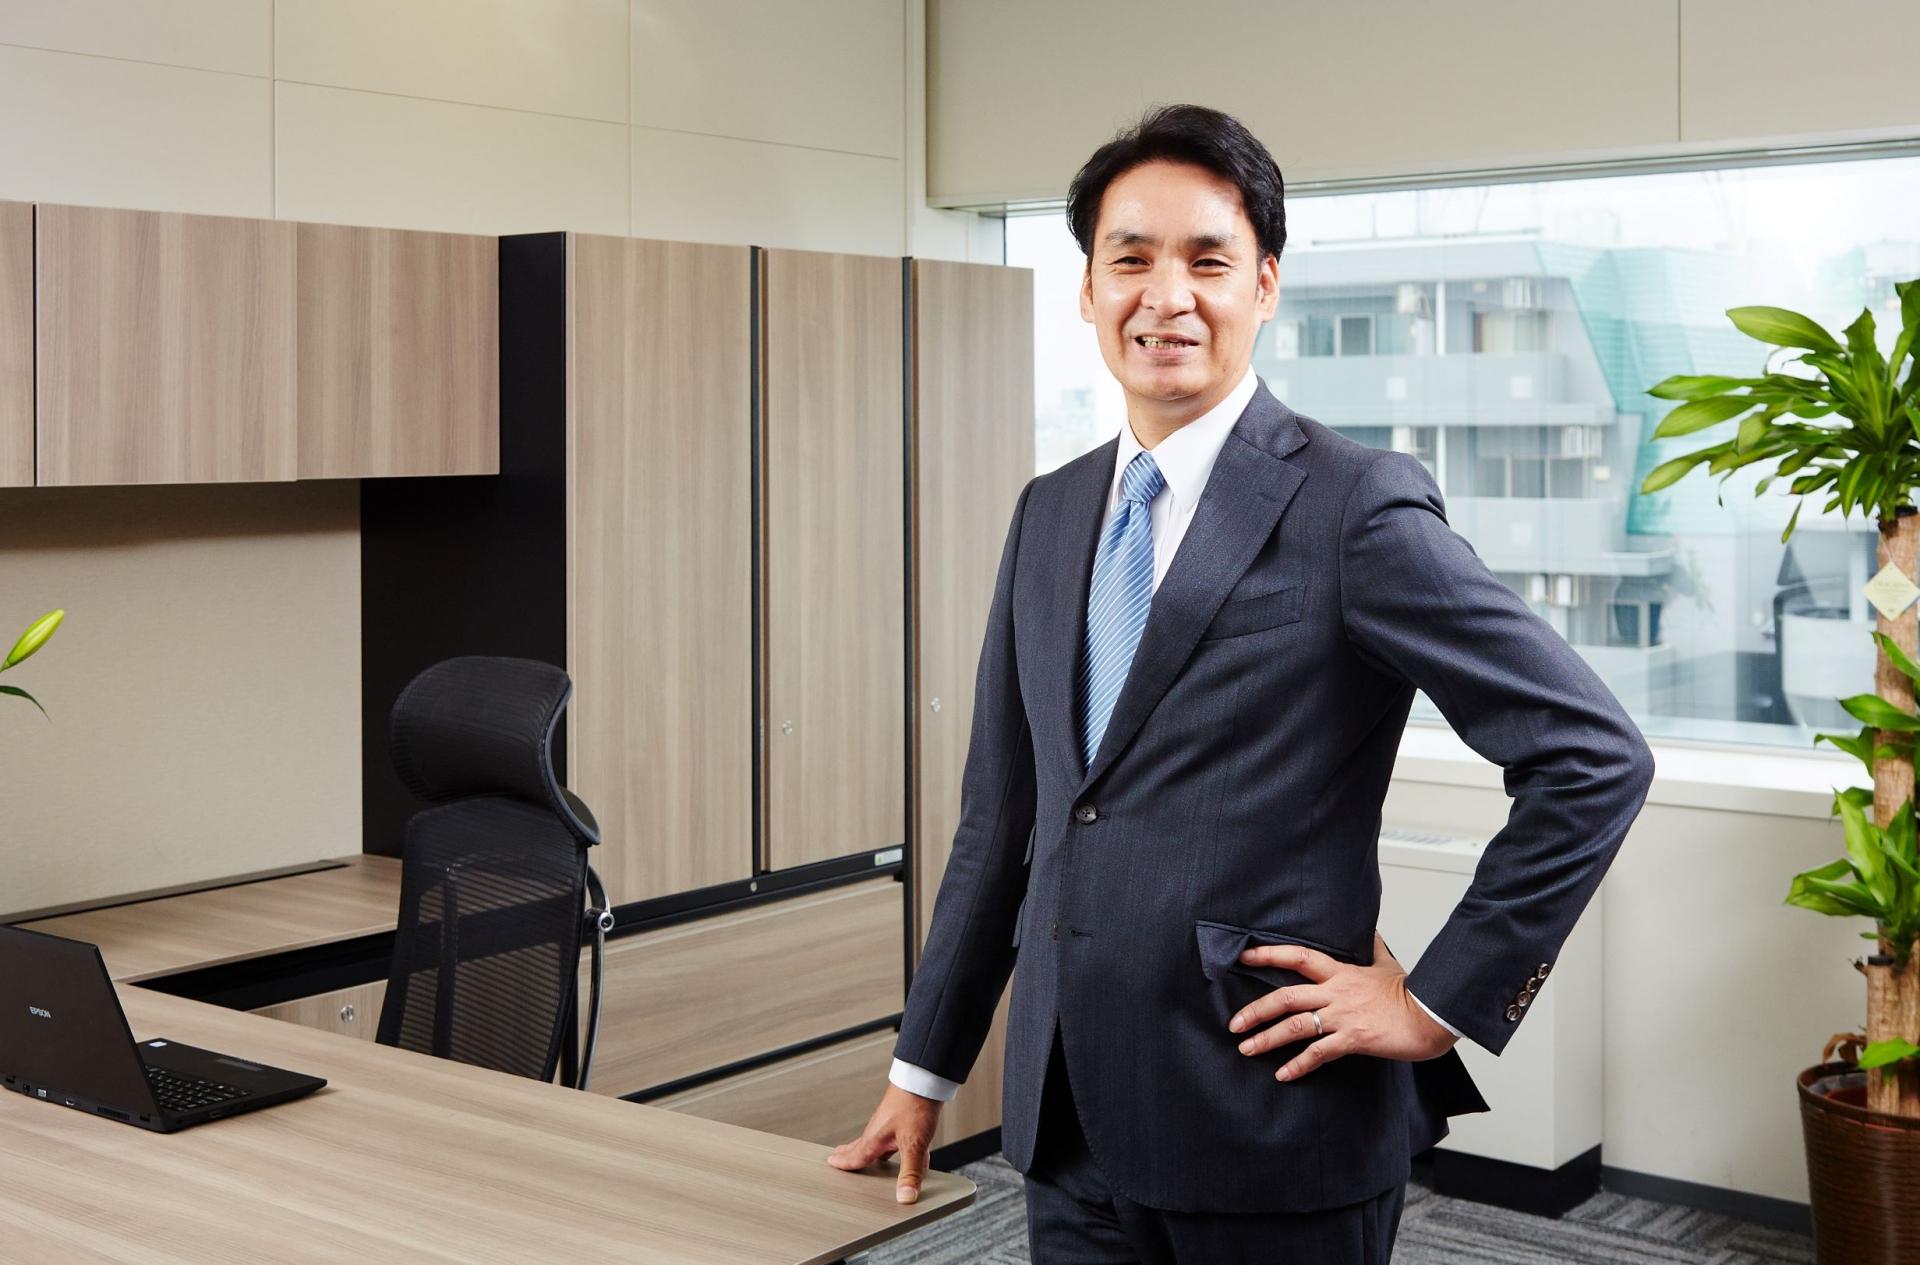 株式会社エスピック 代表取締役社長 白川 満貴